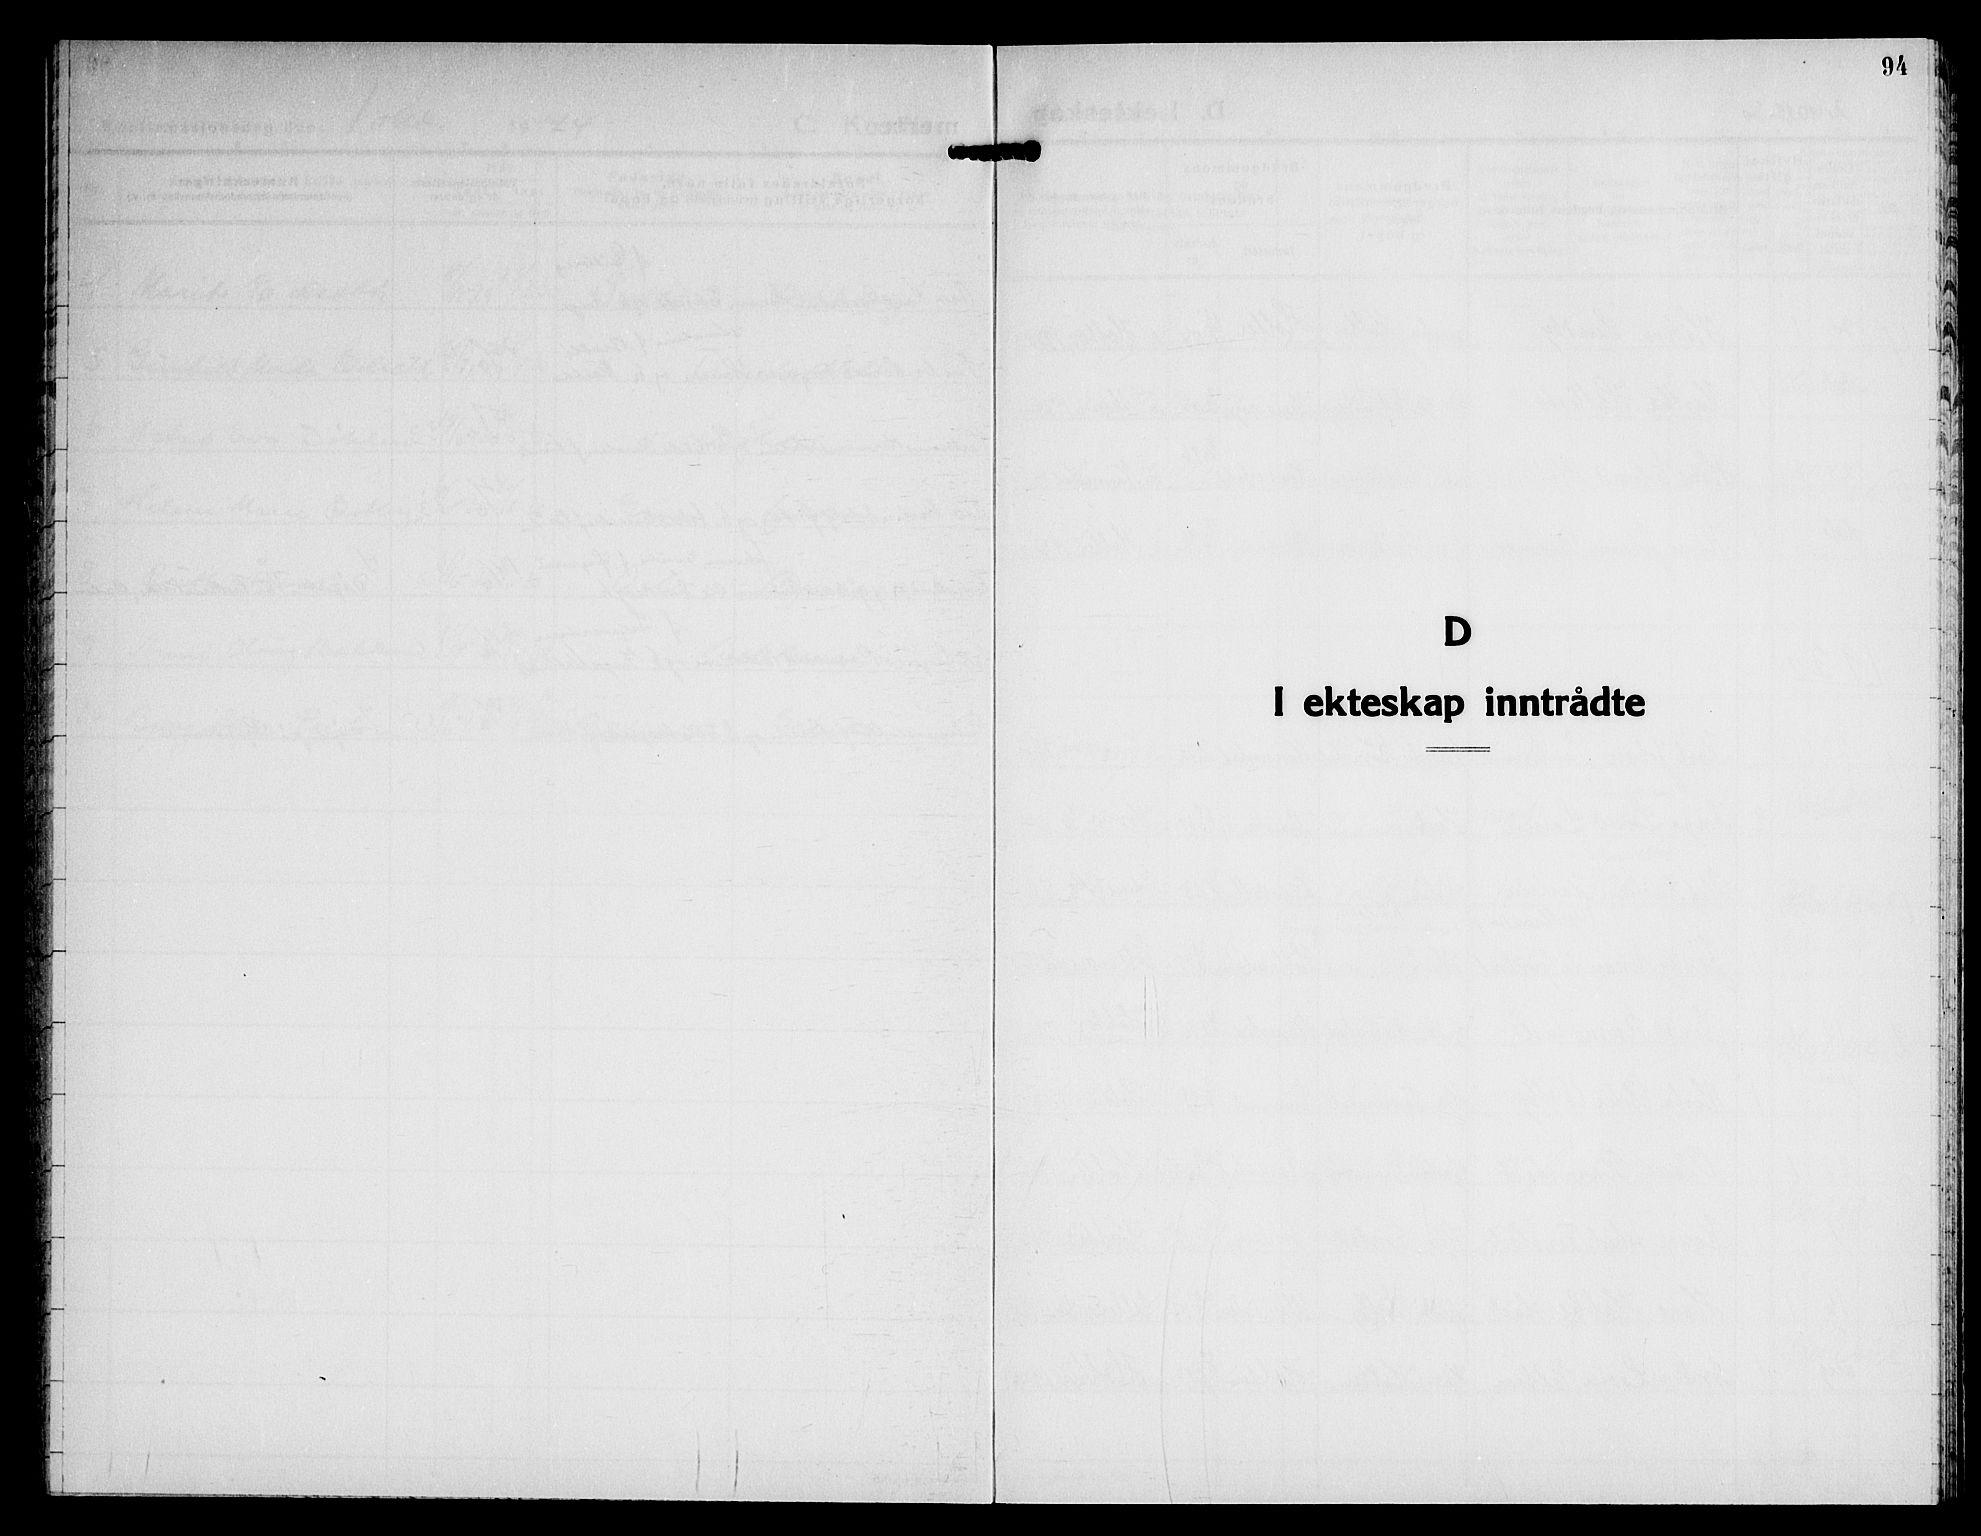 SAO, Nannestad prestekontor Kirkebøker, G/Gb/L0003: Klokkerbok nr. II 3, 1929-1946, s. 94